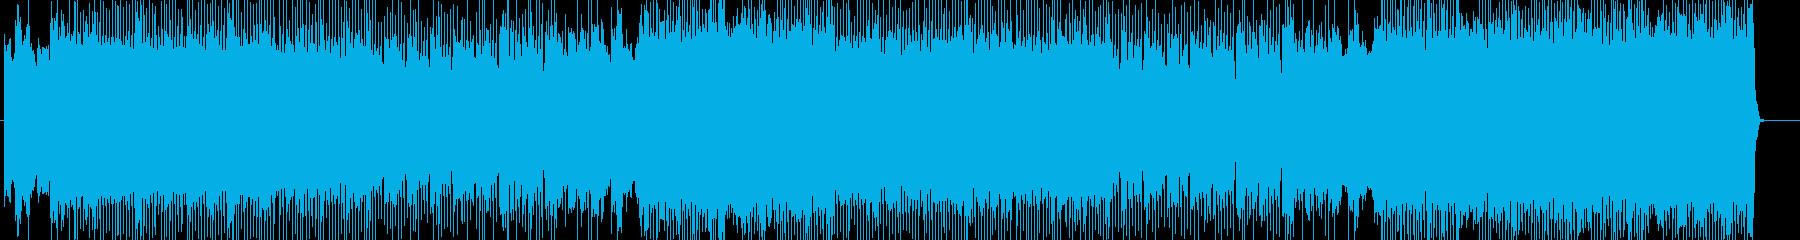 「HR/HM」「ROCK」BGM101の再生済みの波形